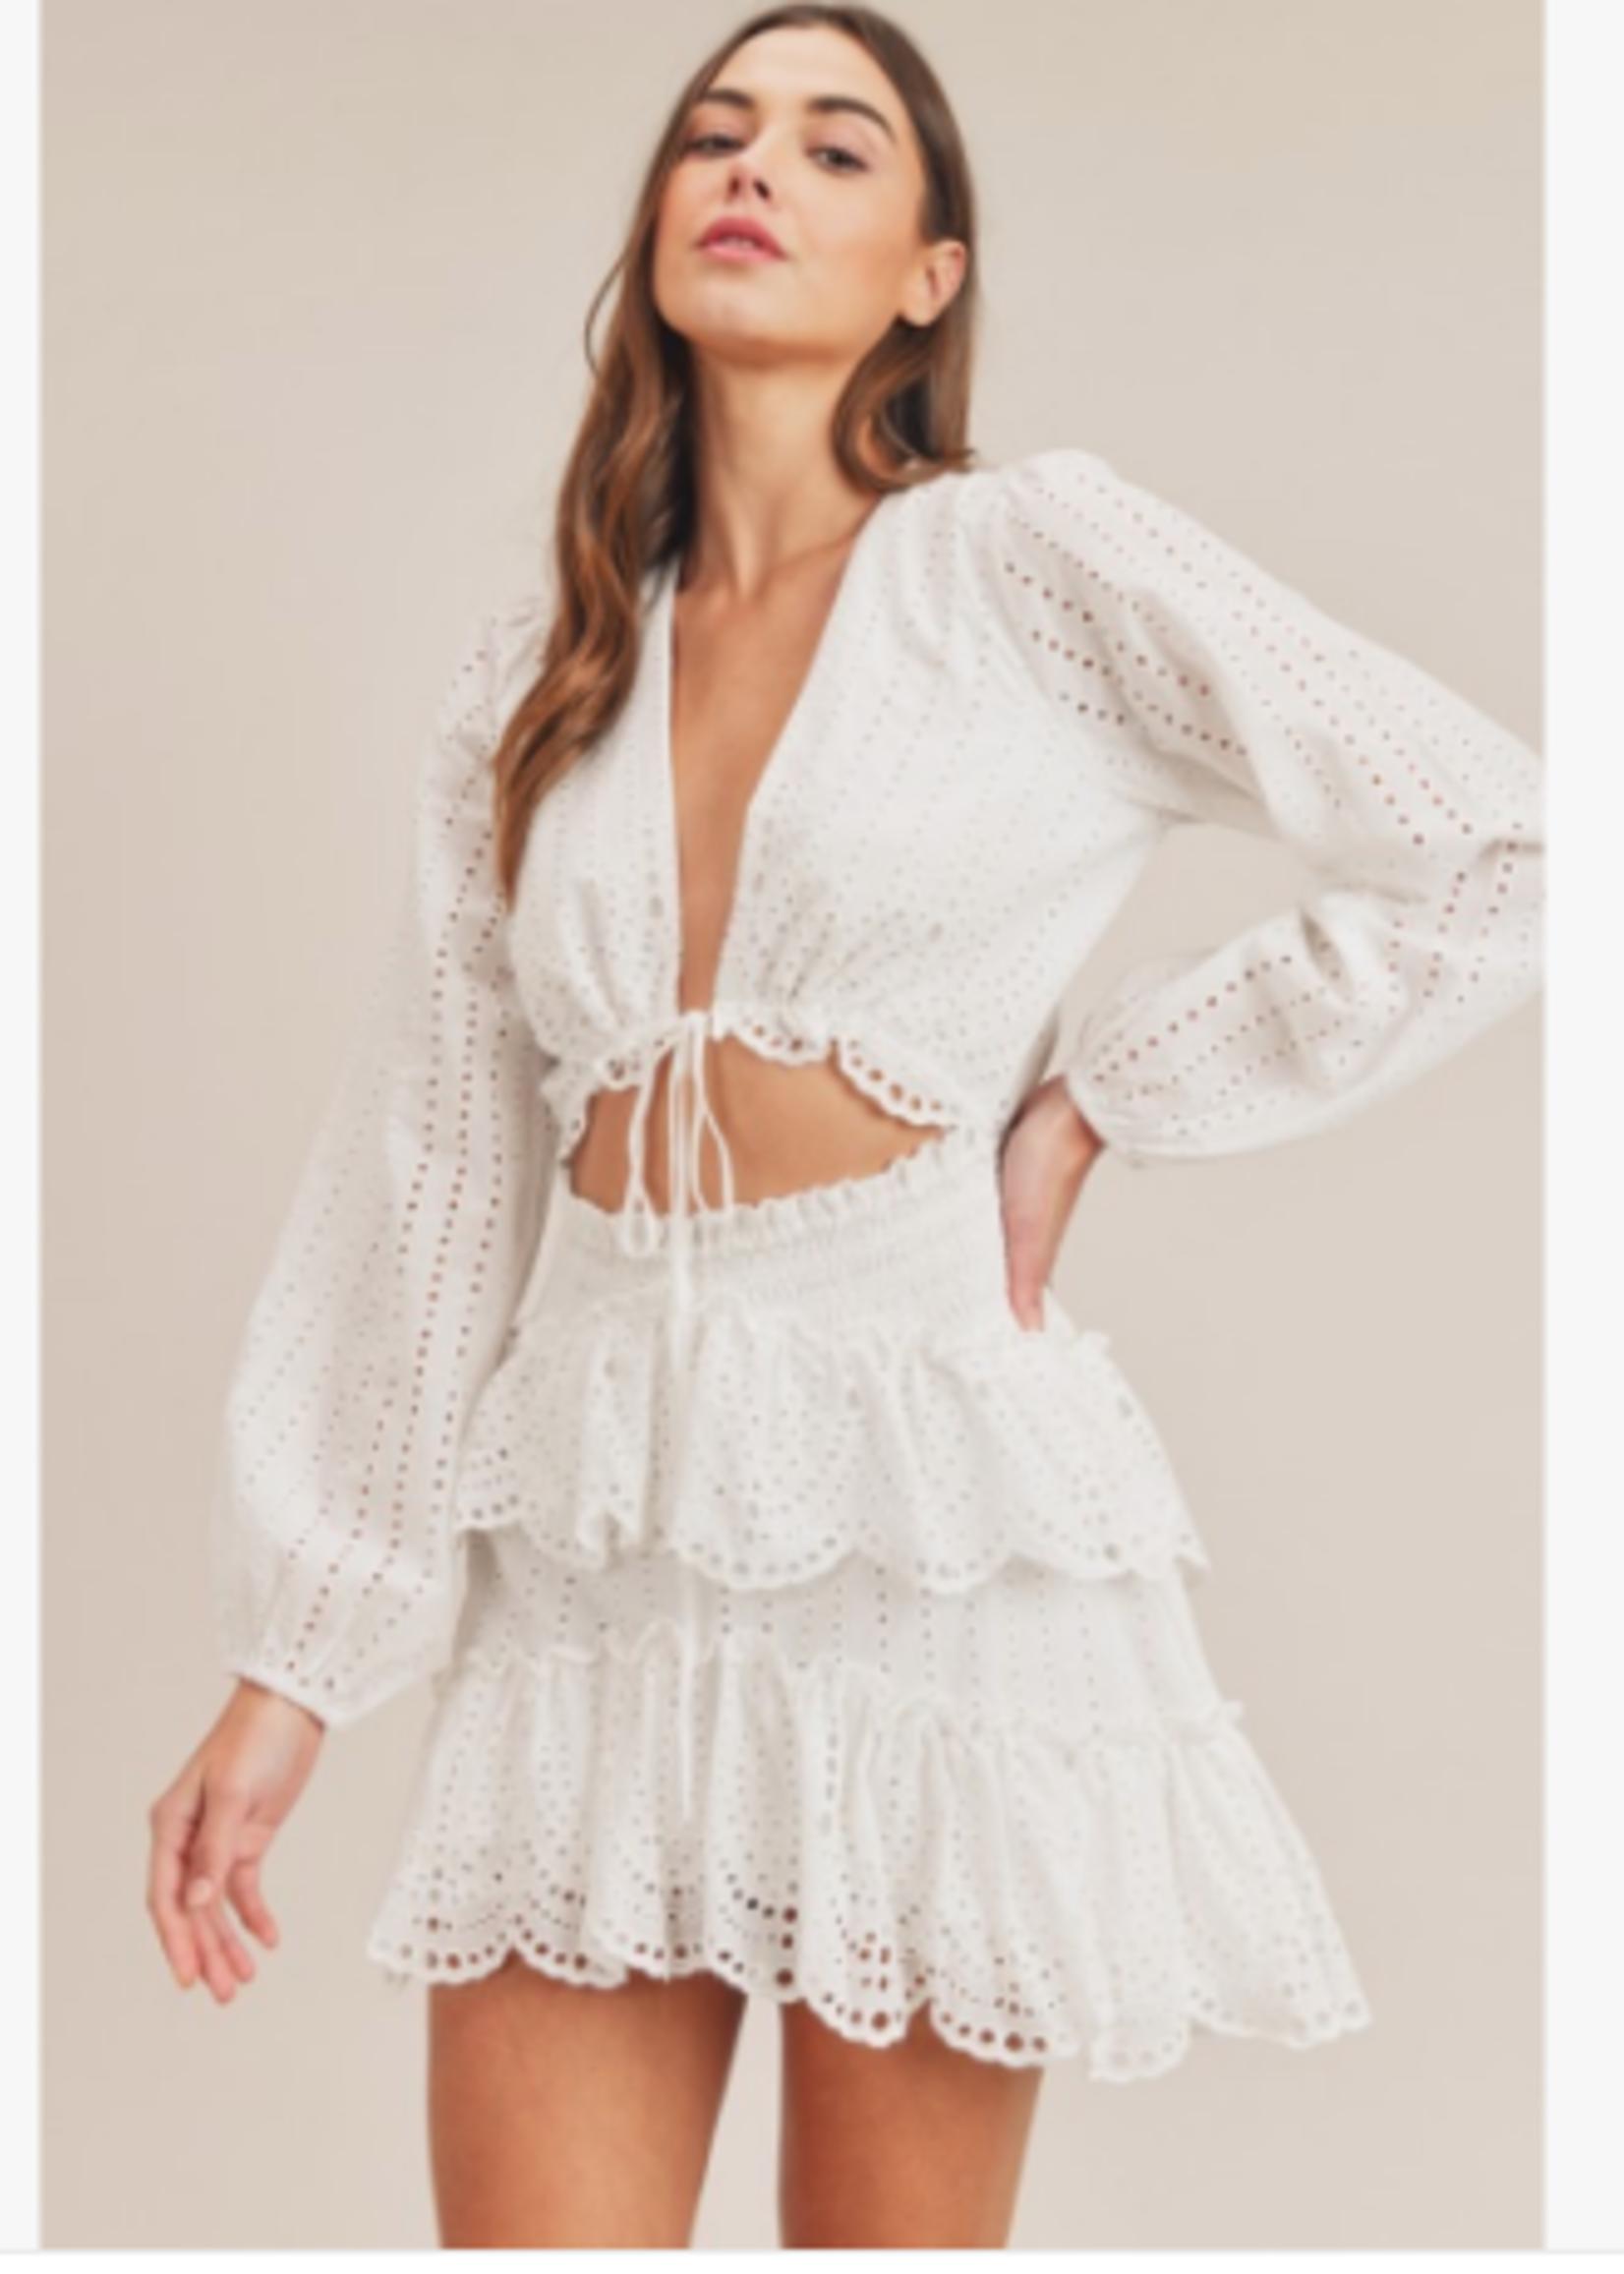 Best Dressed White Eyelet Dress